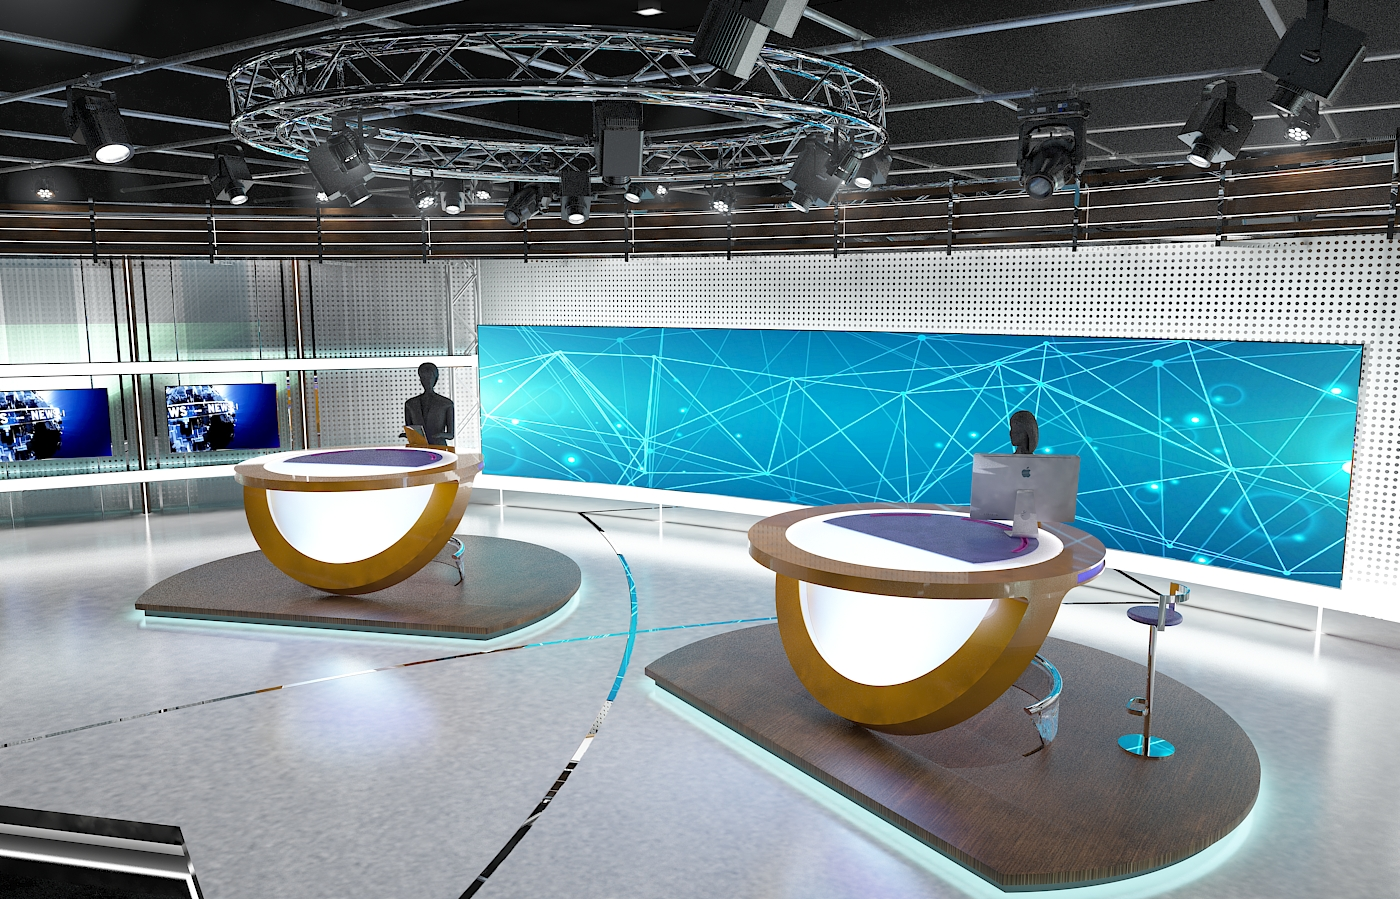 виртуал телевизийн студи цуглуулга vol 6 3d загвар max dxf dwg fbx obj 223408